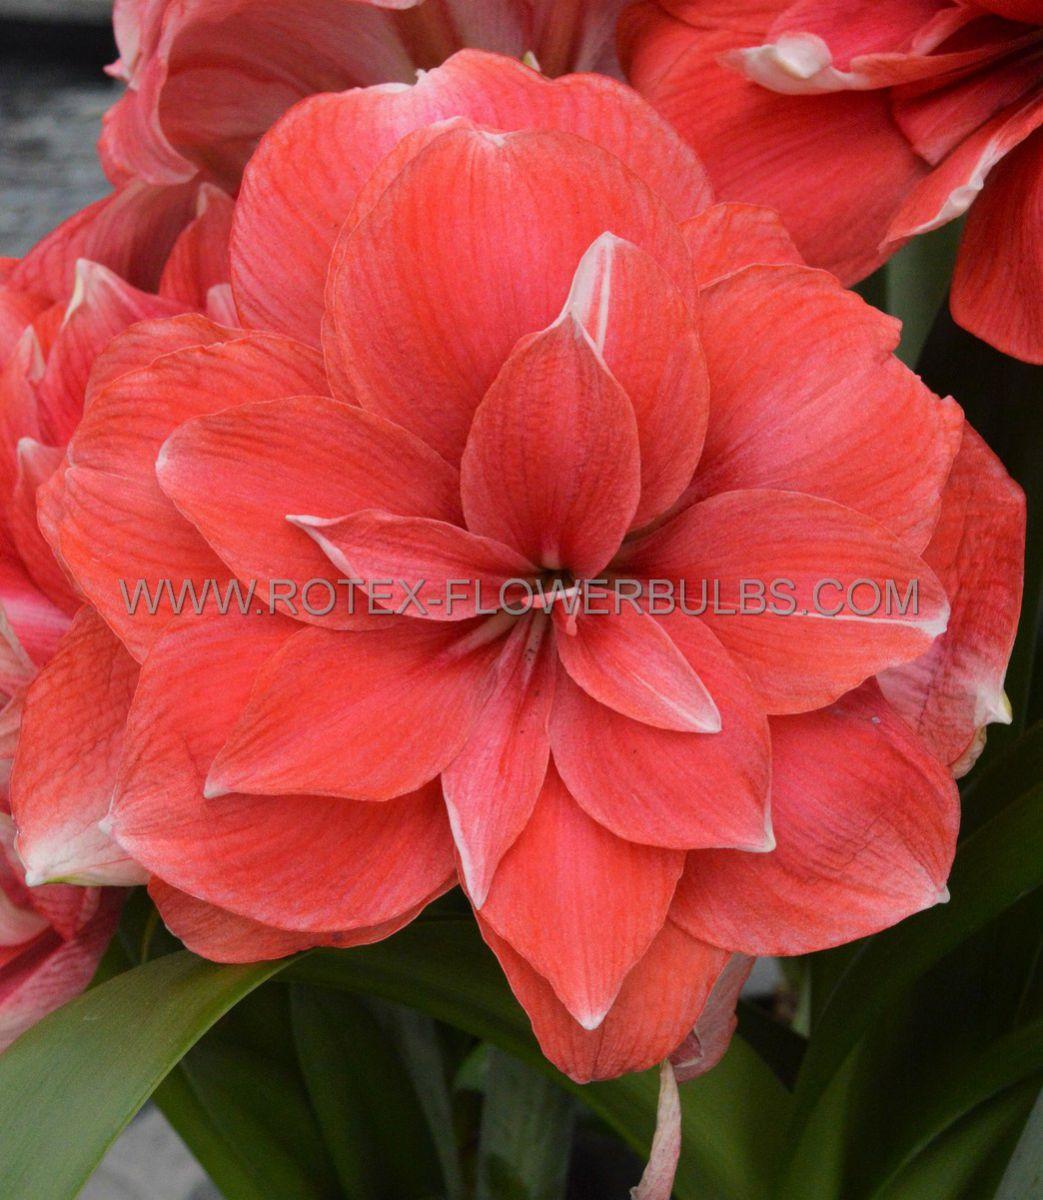 hippeastrum amaryllis unique double flowering double dream 3436 cm 30 p carton